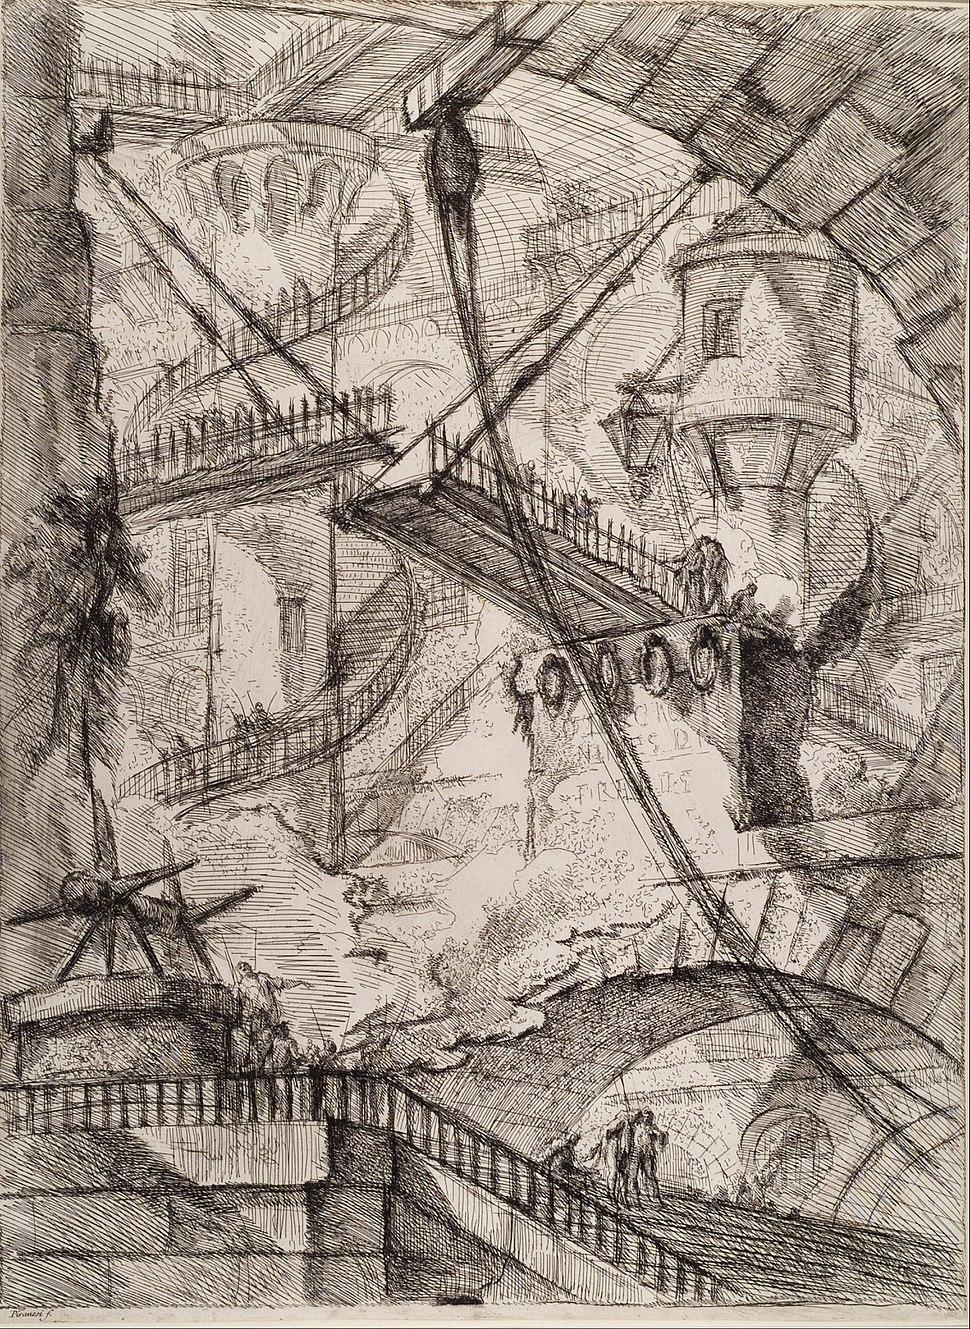 Giovanni Battista Piranesi - The Drawbridge - Google Art Project